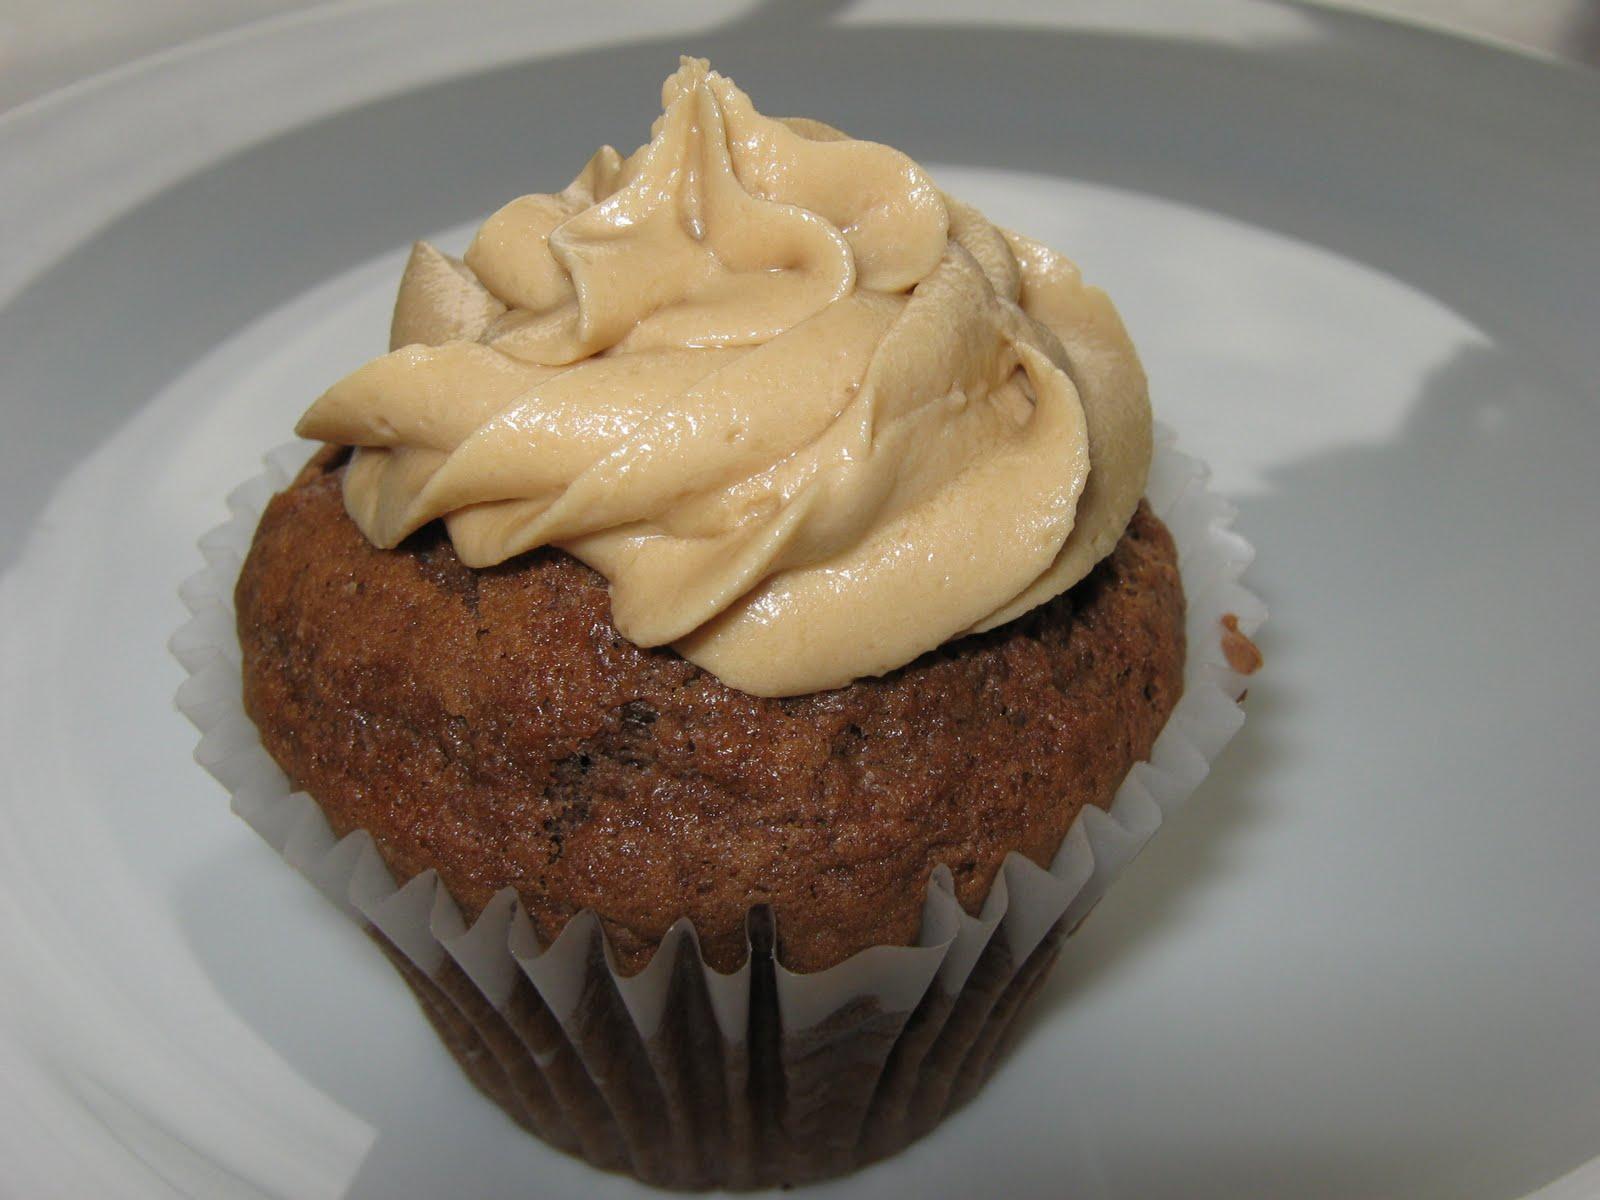 Moule Cup Cake La Petite Sir Ef Bf Bdne